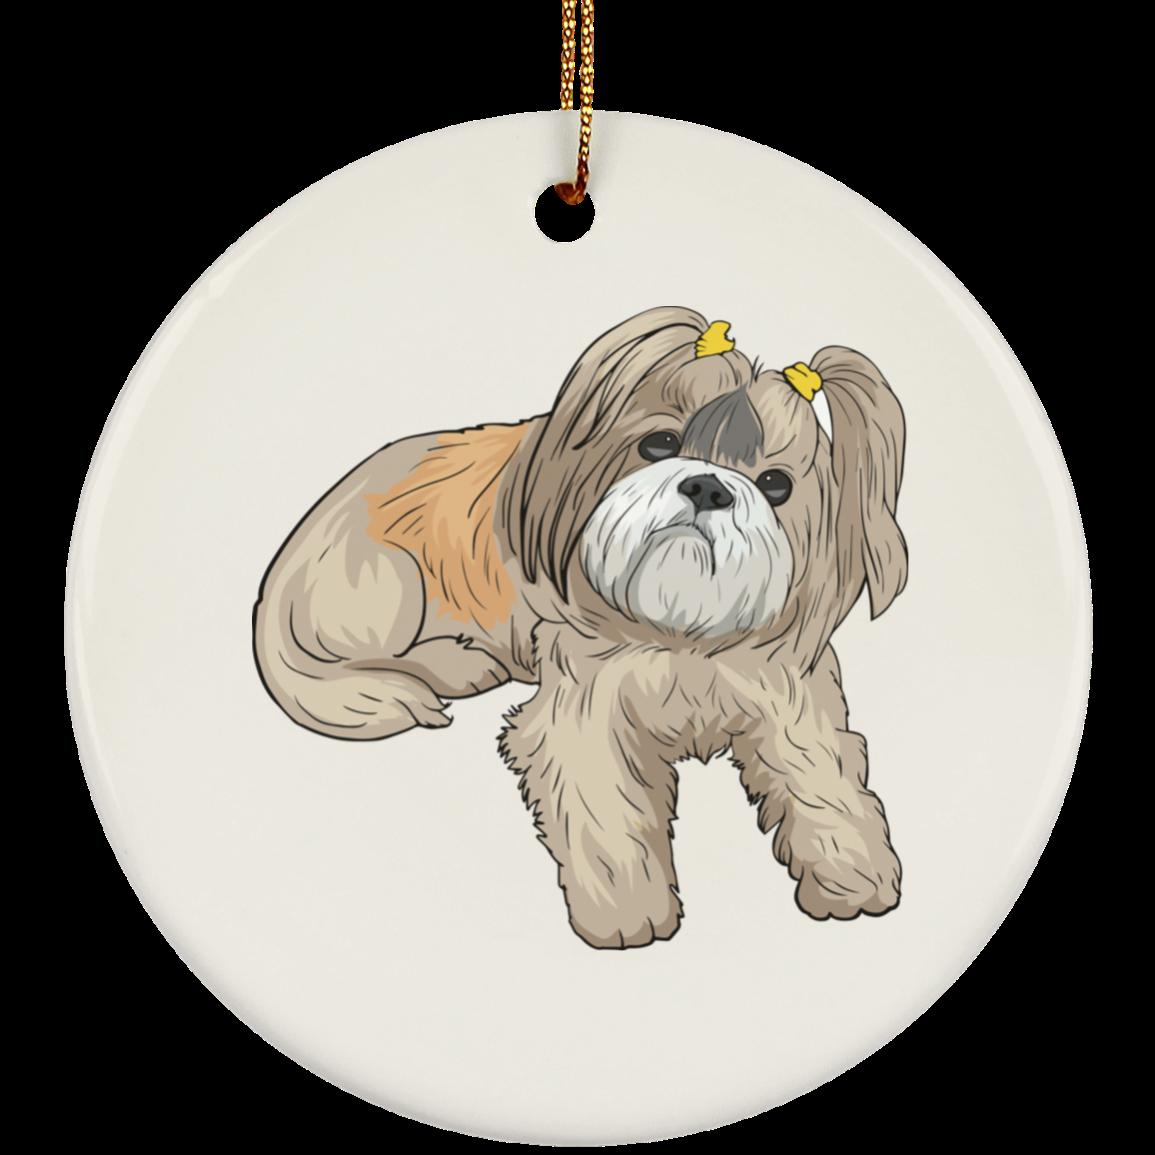 Shih Tzu Dog Ornament Christmas Tree Ornaments Holiday ...